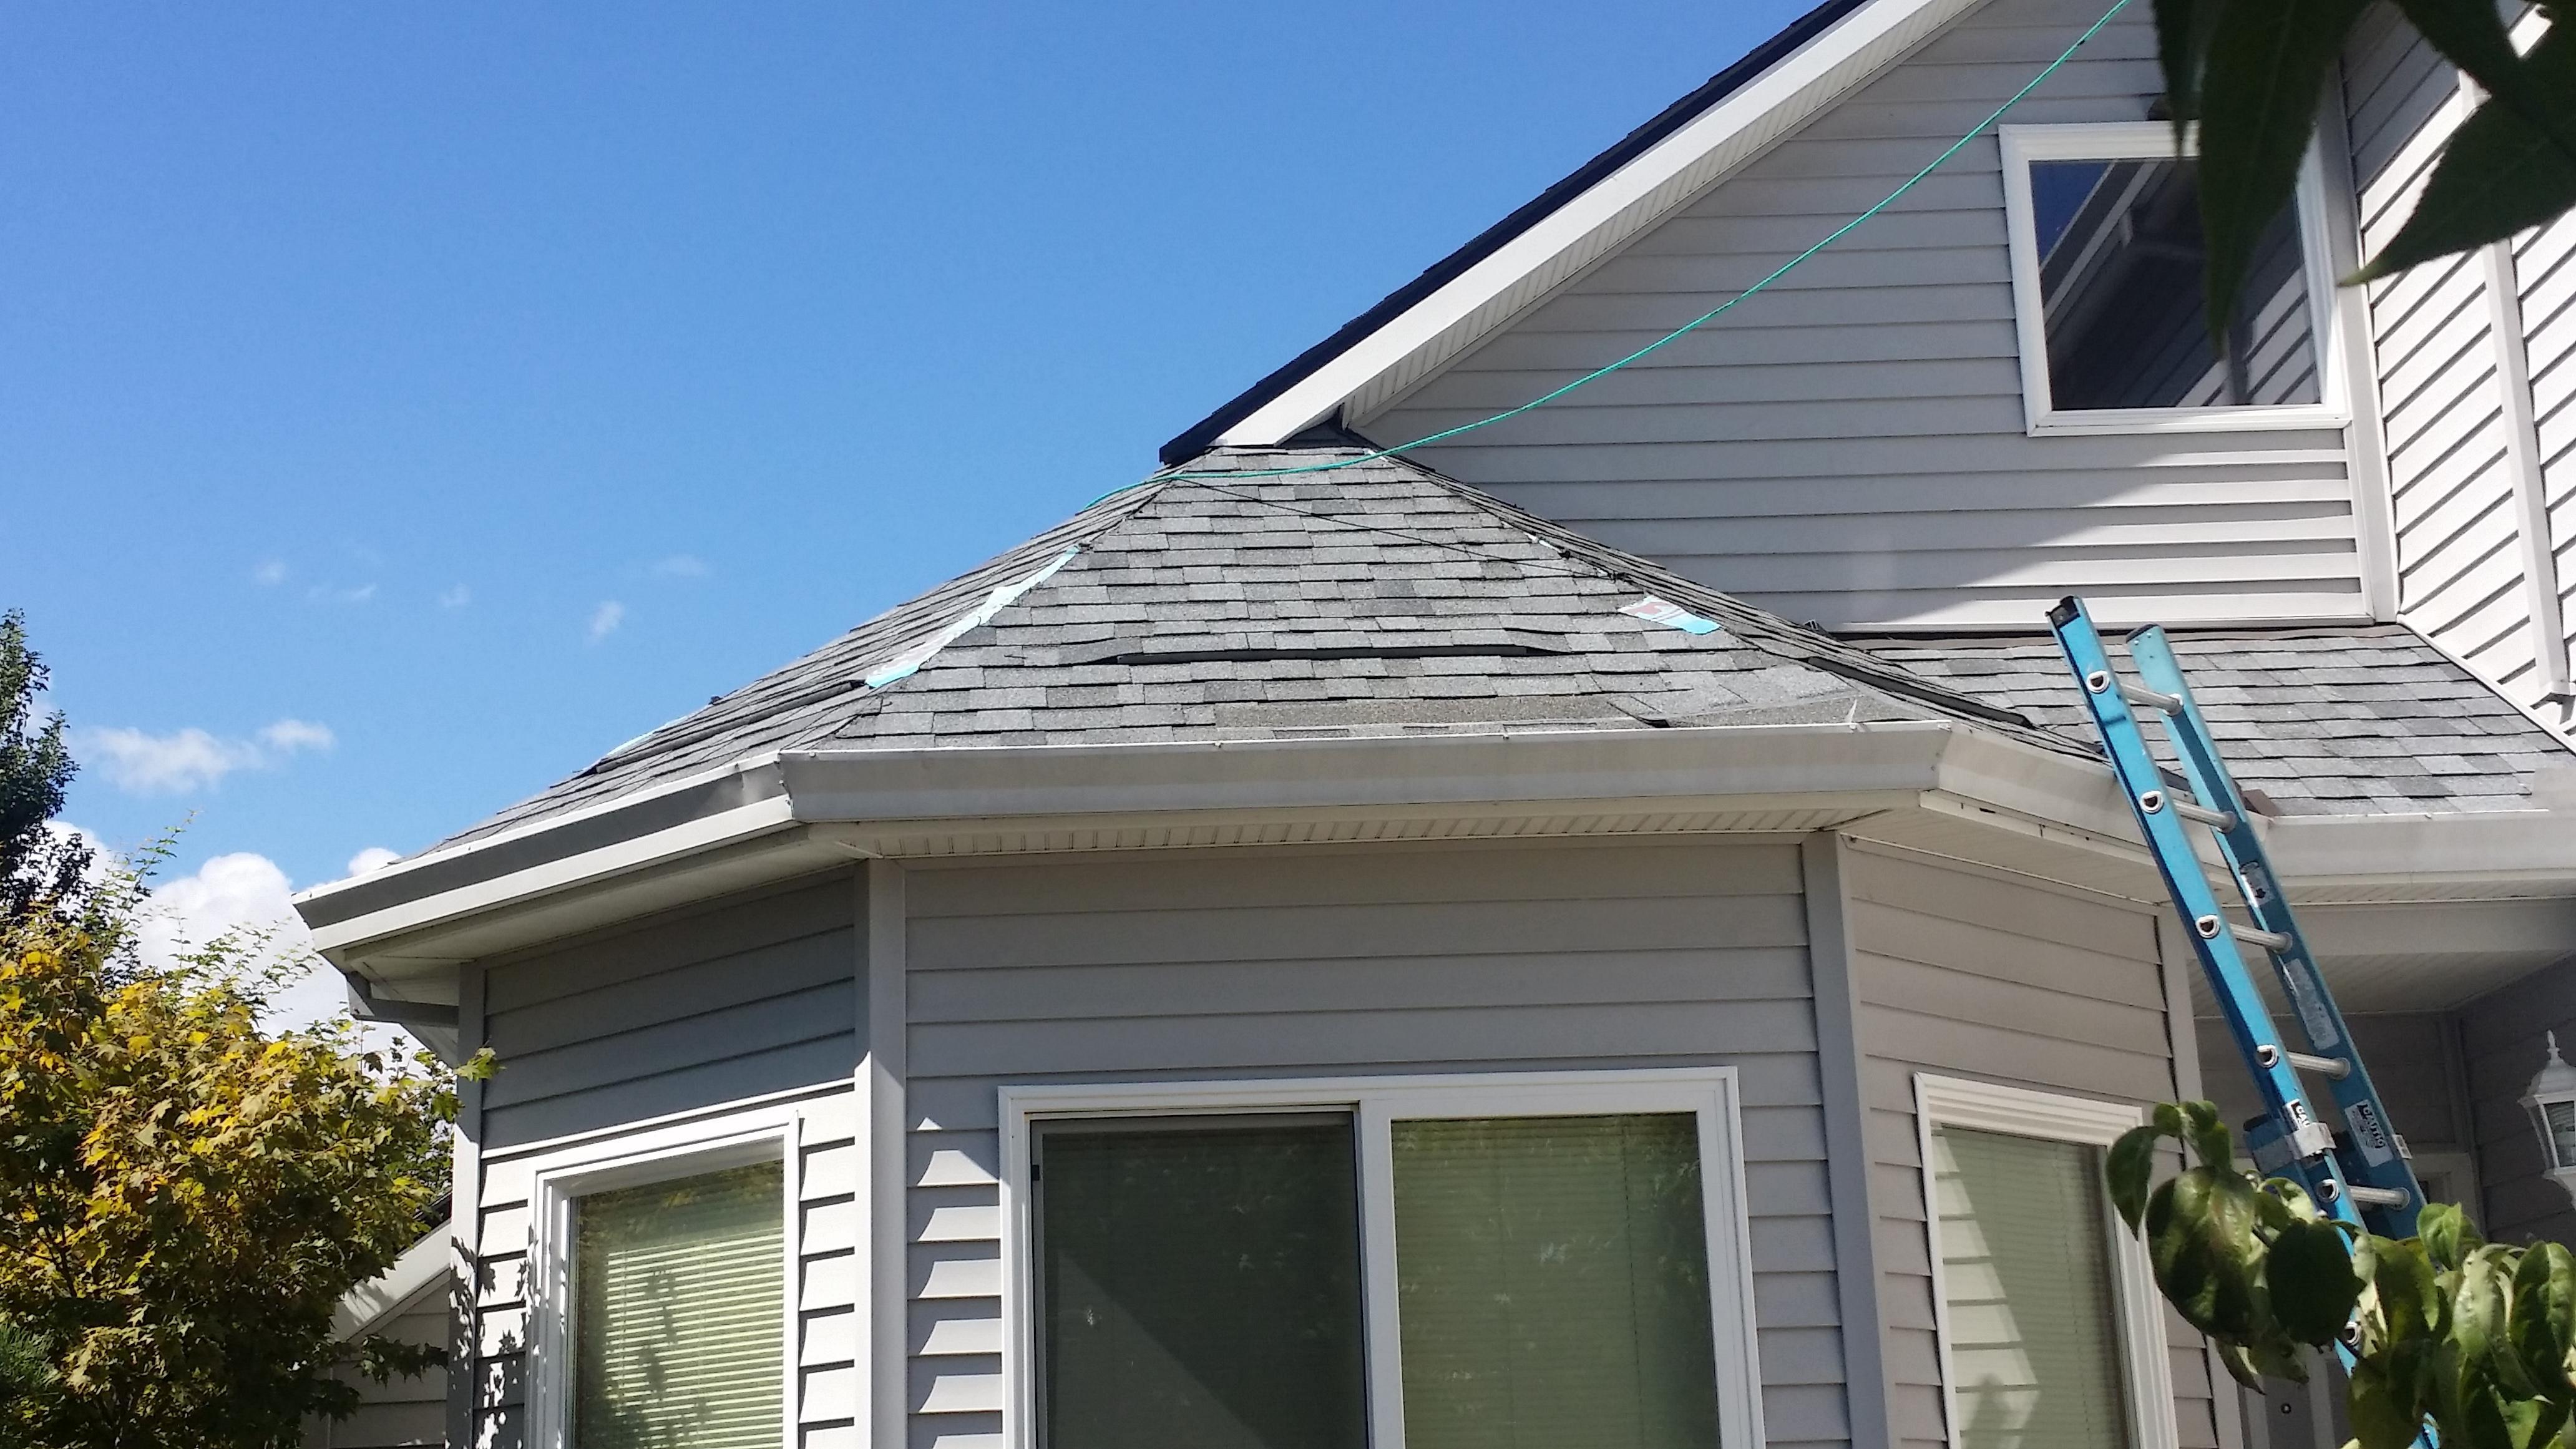 Roofing Rain OR Shine, LLC image 6